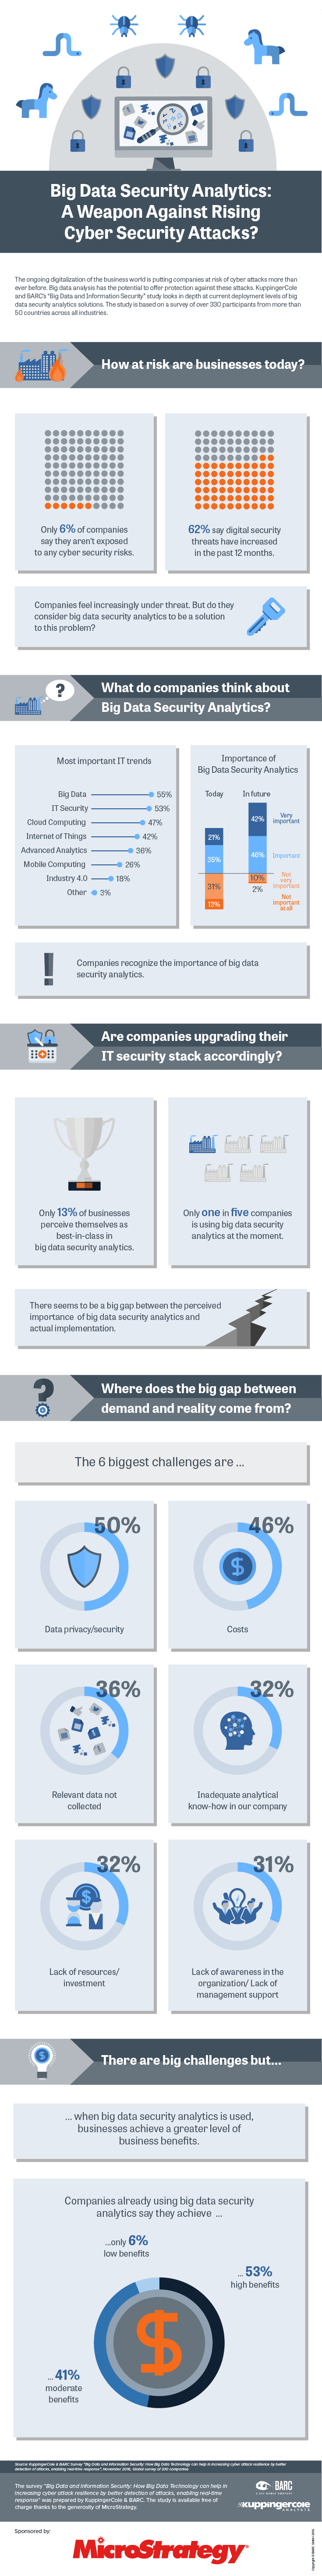 Big Data and Security Analytics Infographic